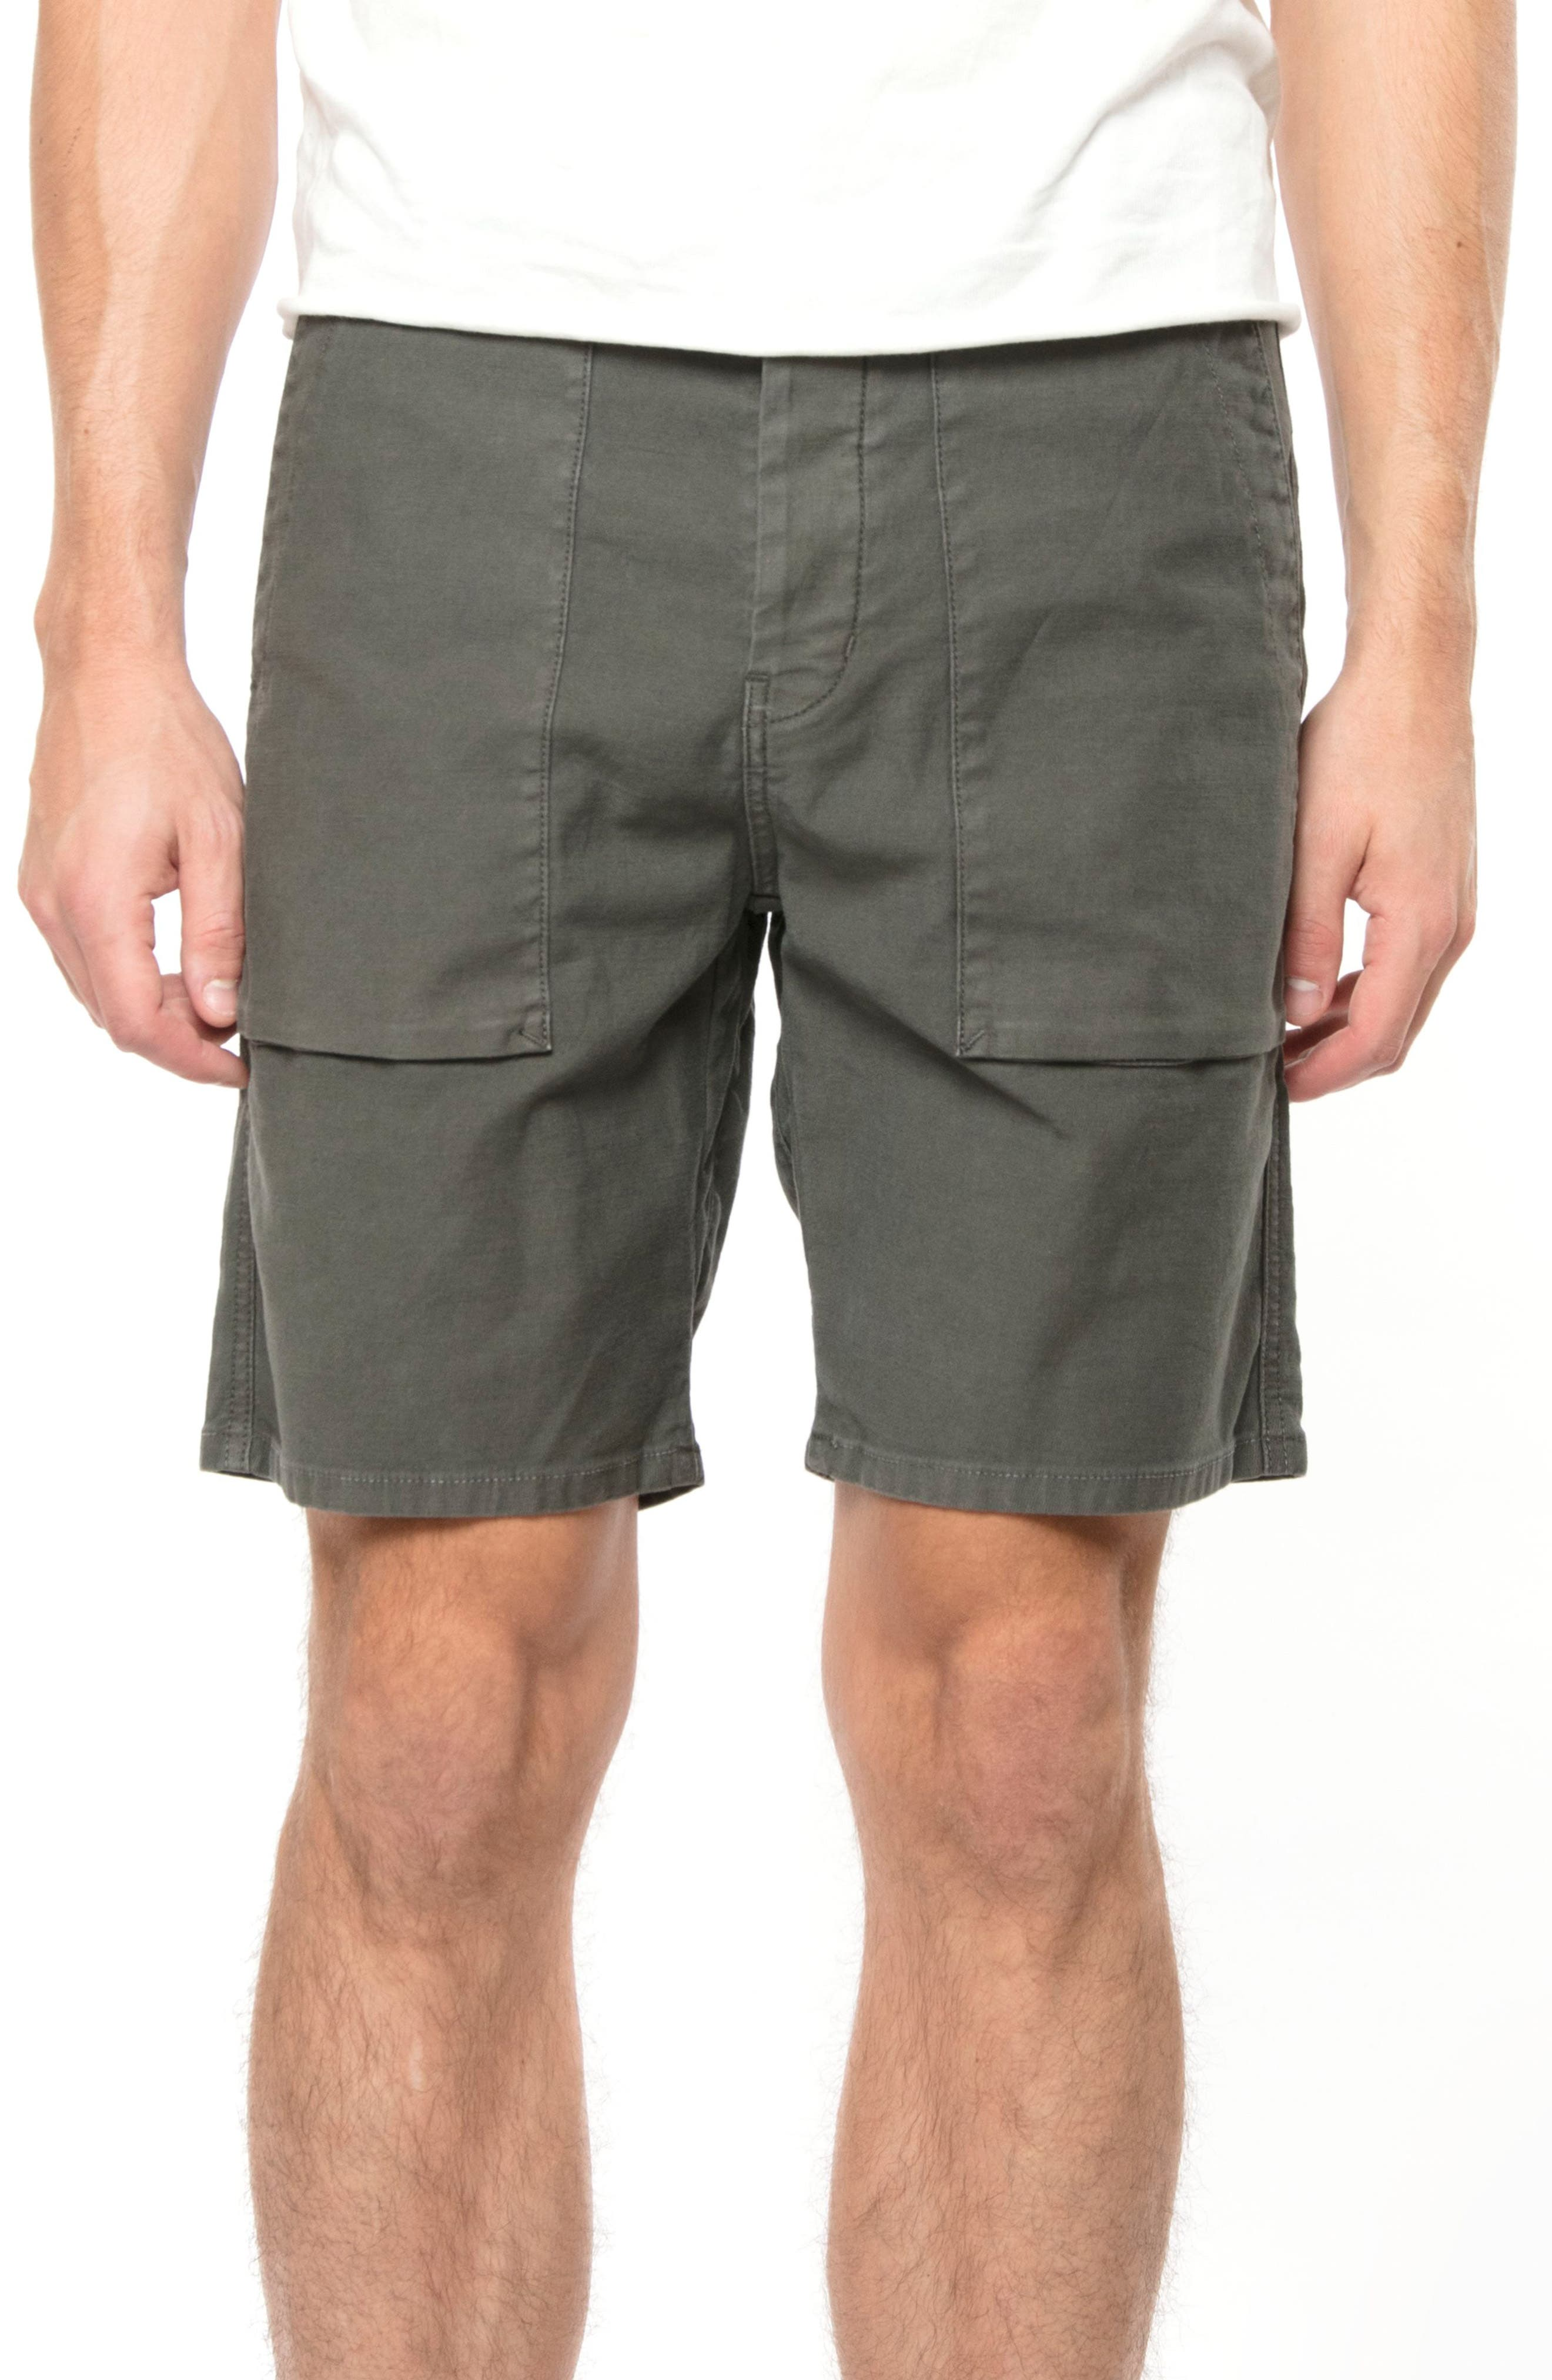 Kontact Shorts,                             Main thumbnail 1, color,                             Dull Catapult